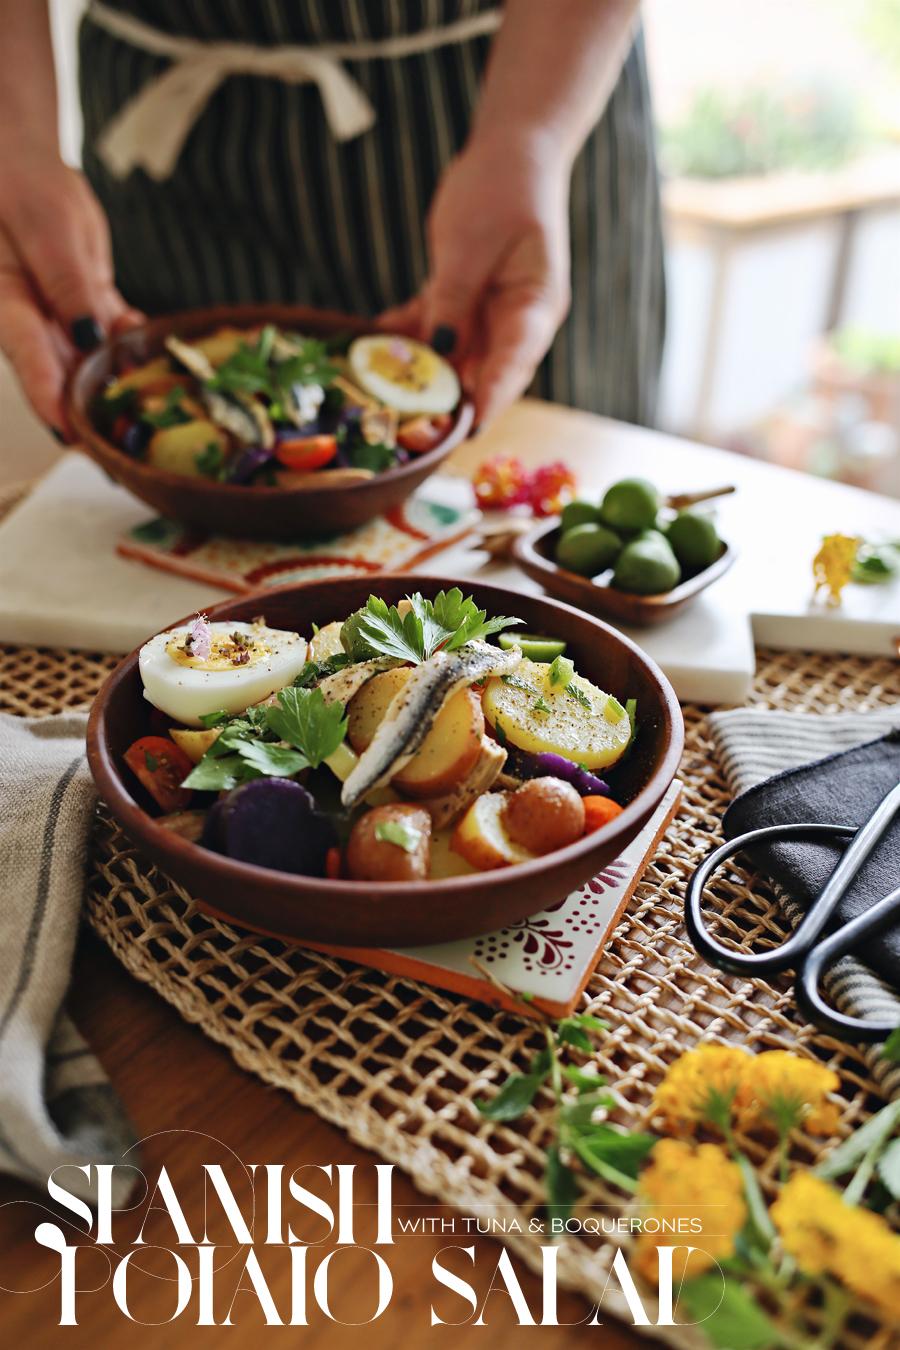 02_spanish-potato-salad_dine-x-design